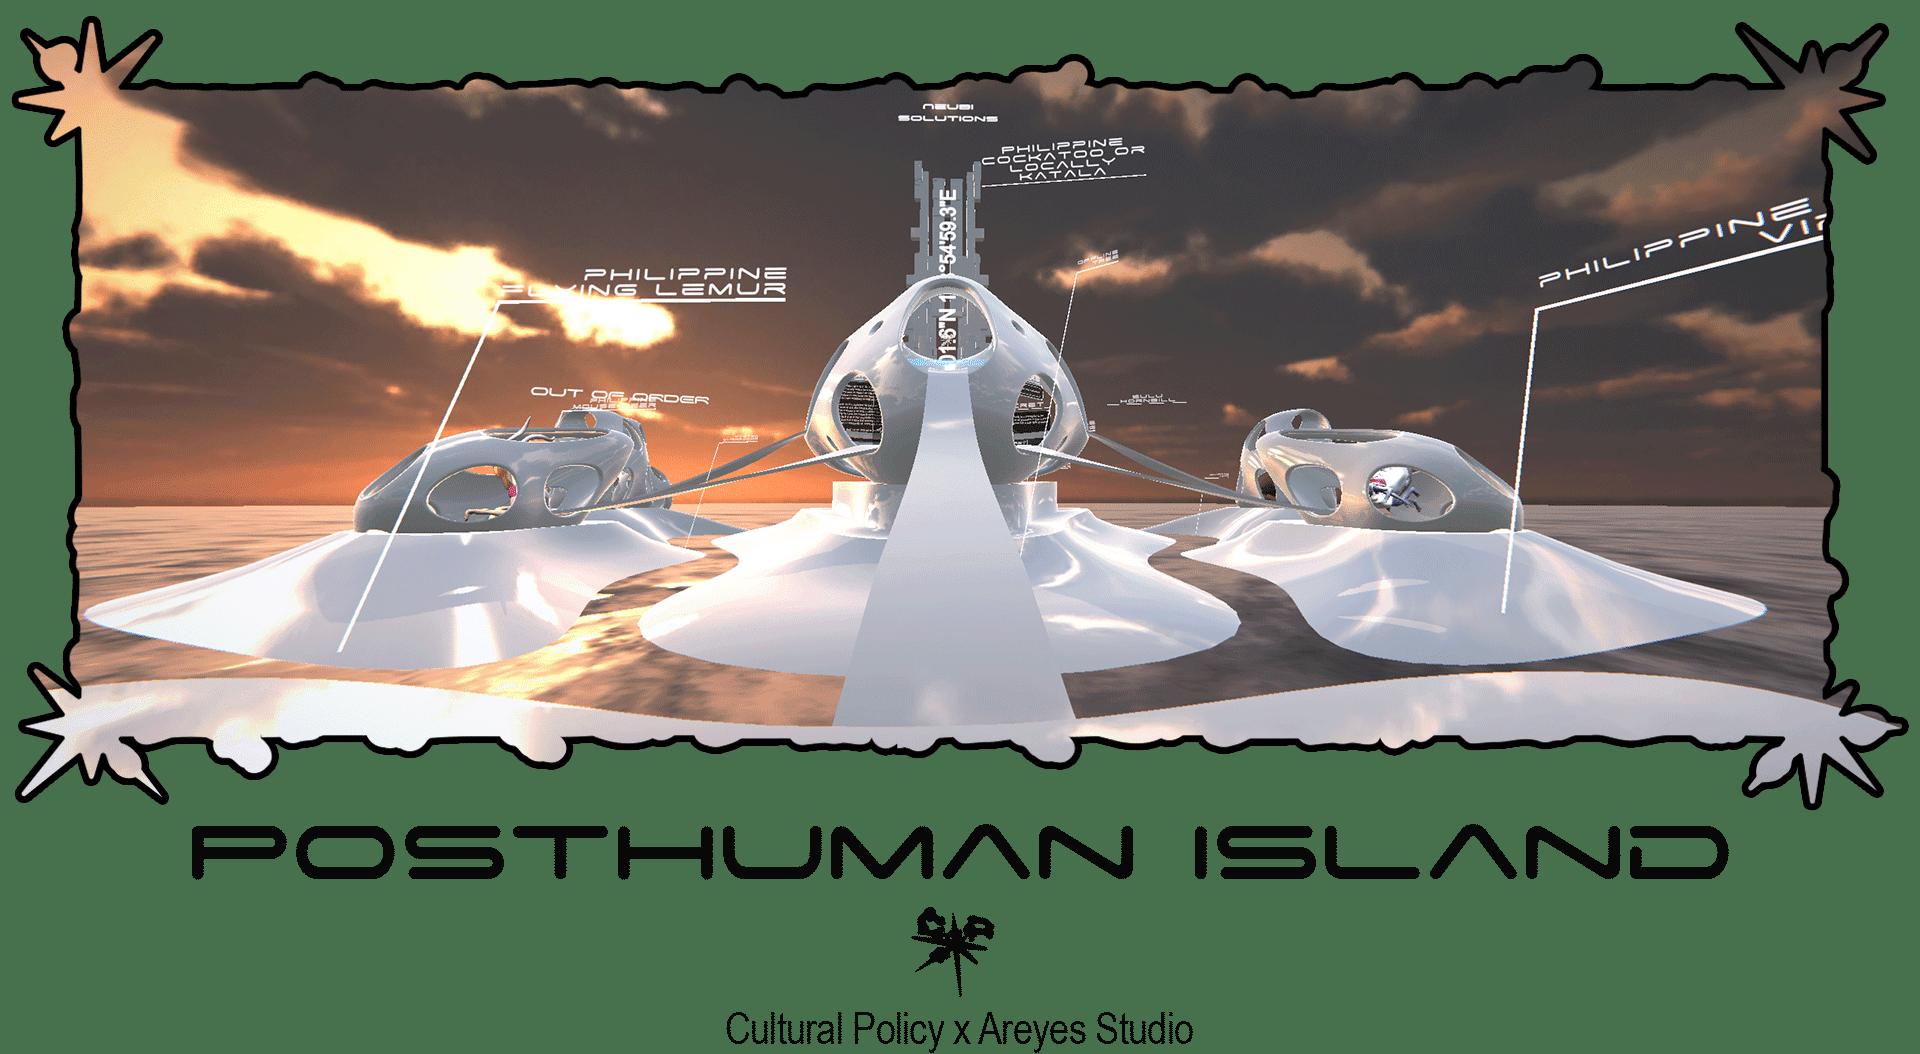 Alice Scope - Post Human Island June 2021 for Agora Digital Art